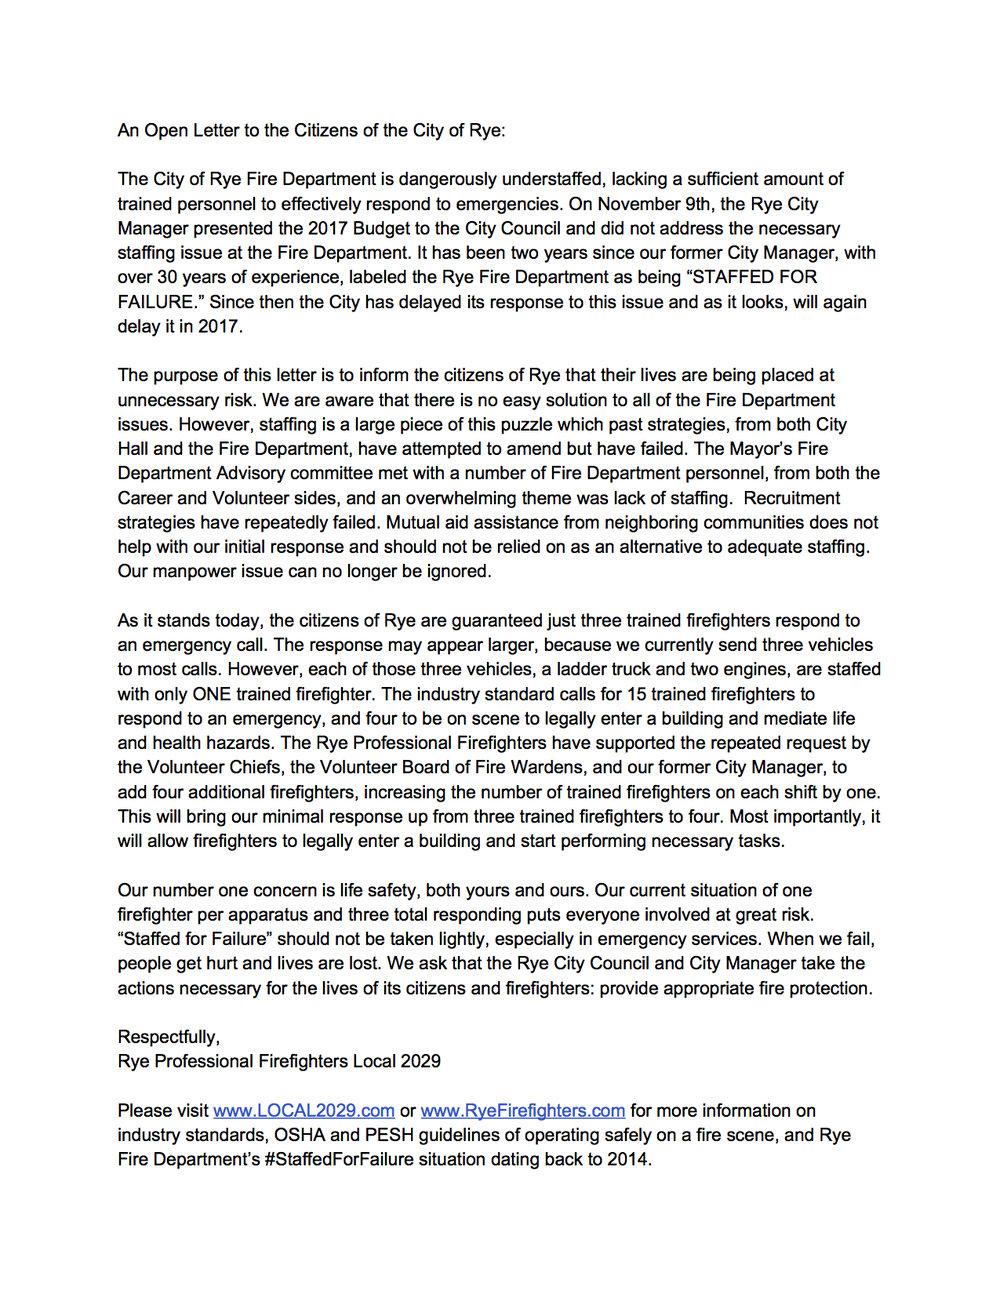 #StaffedforFailure — Rye Professional Firefighters Local 2029